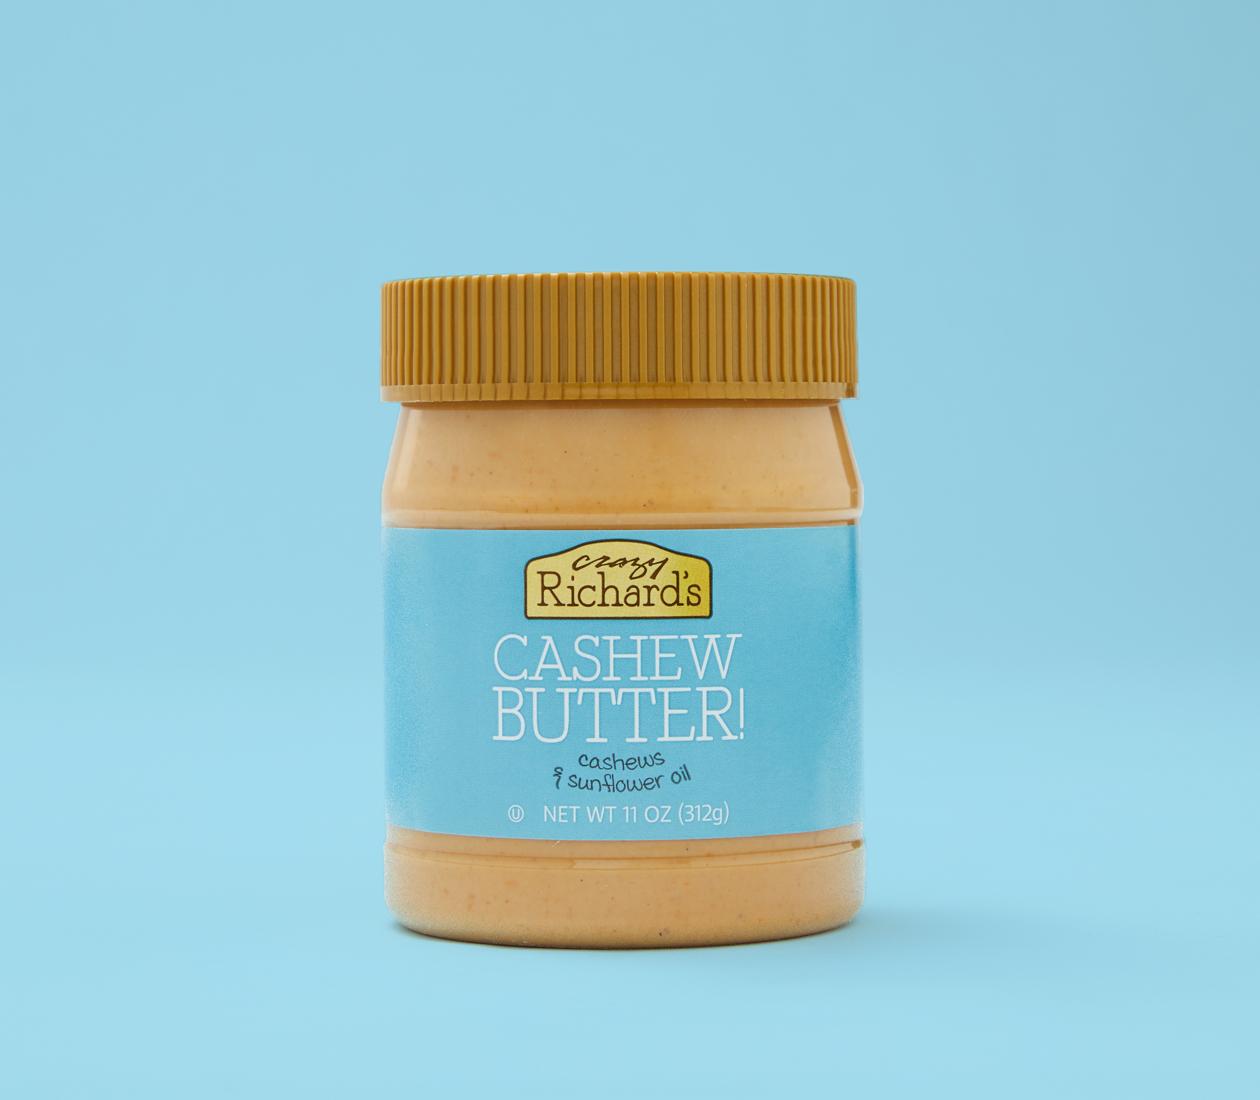 Crazy Richard's cashew butter on blue background